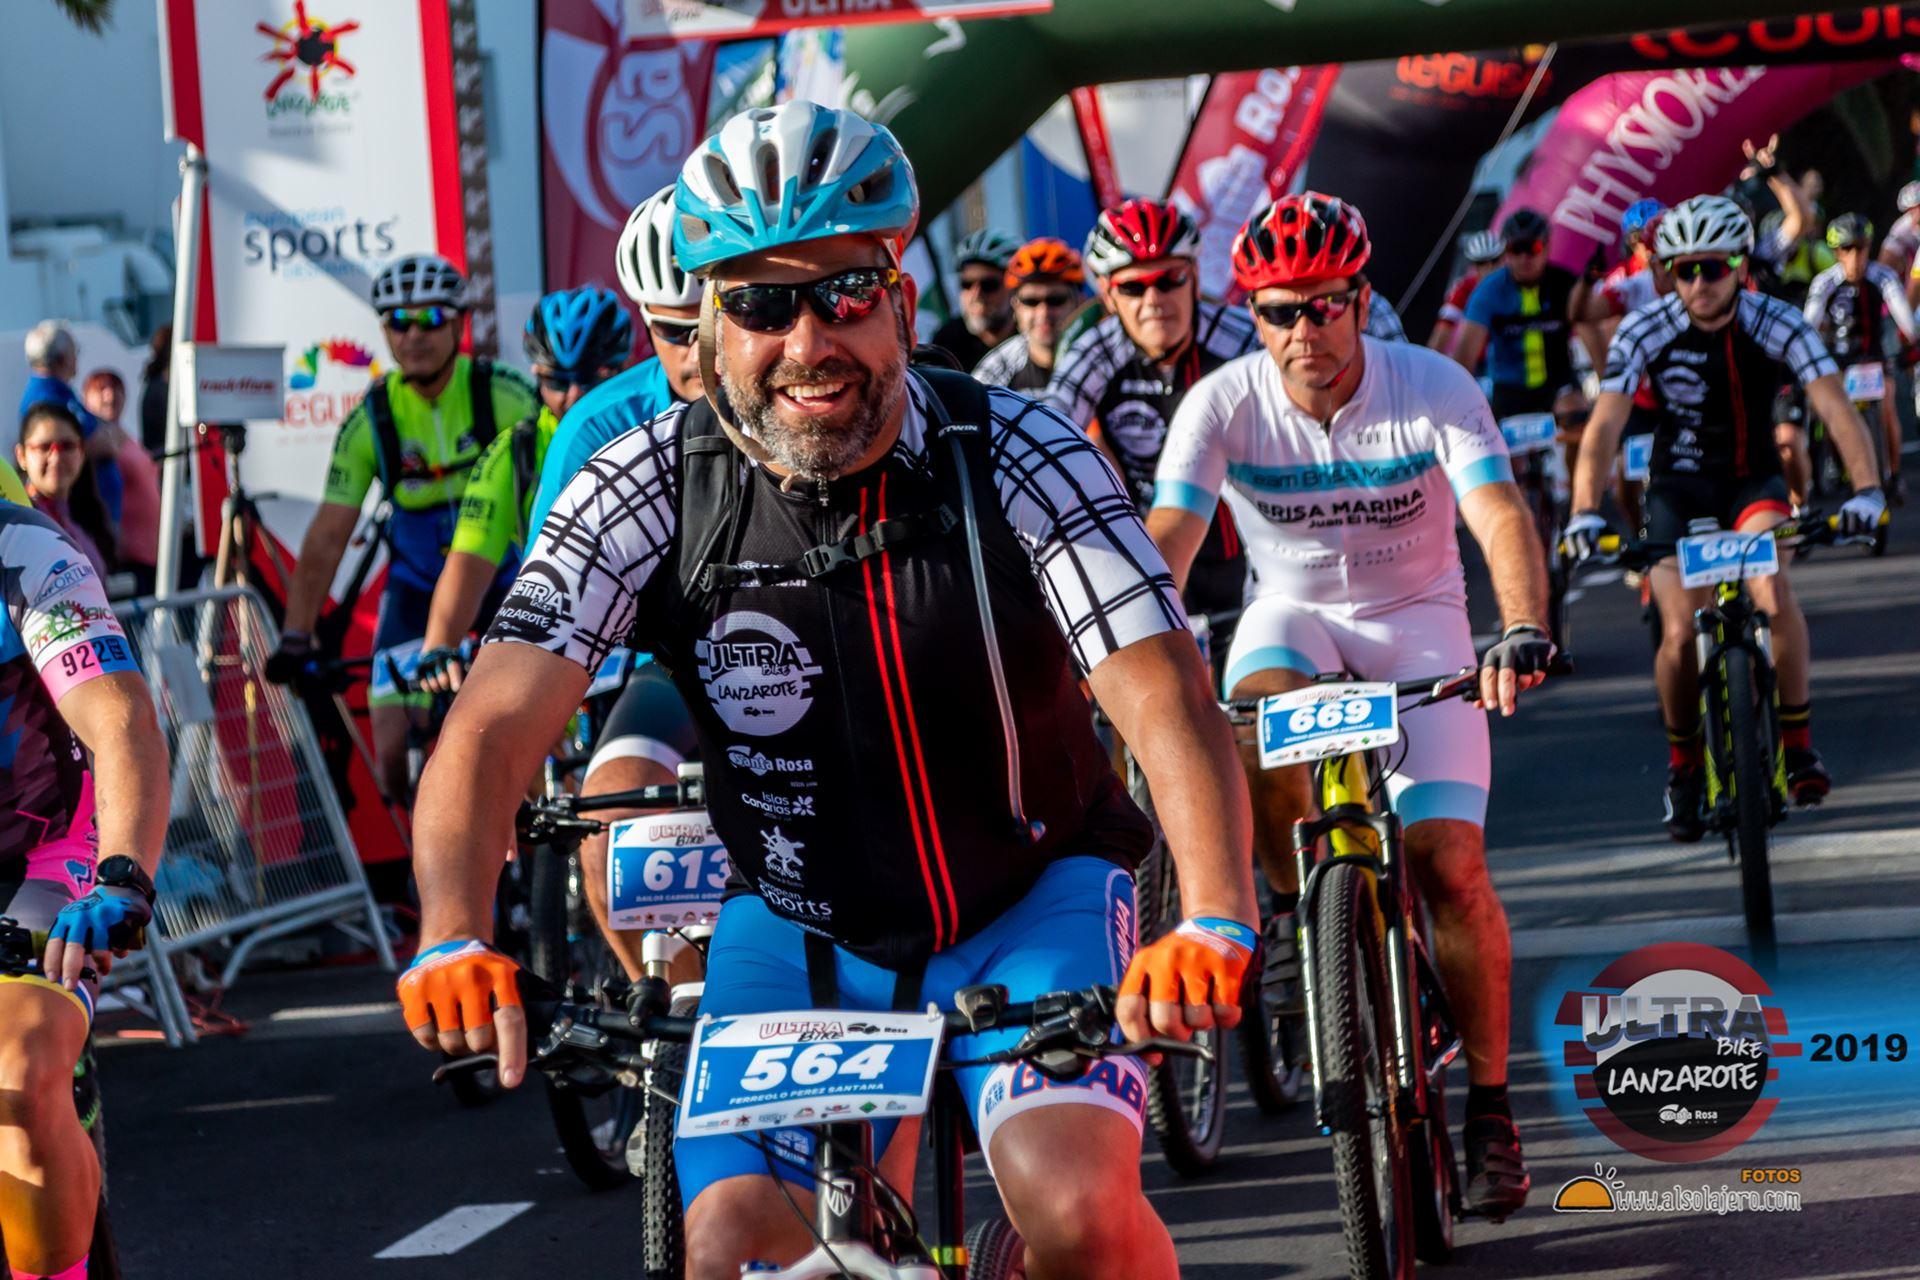 Salida 2ª Etapa Ultrabike 2019 Fotos Alsolajero.com-68